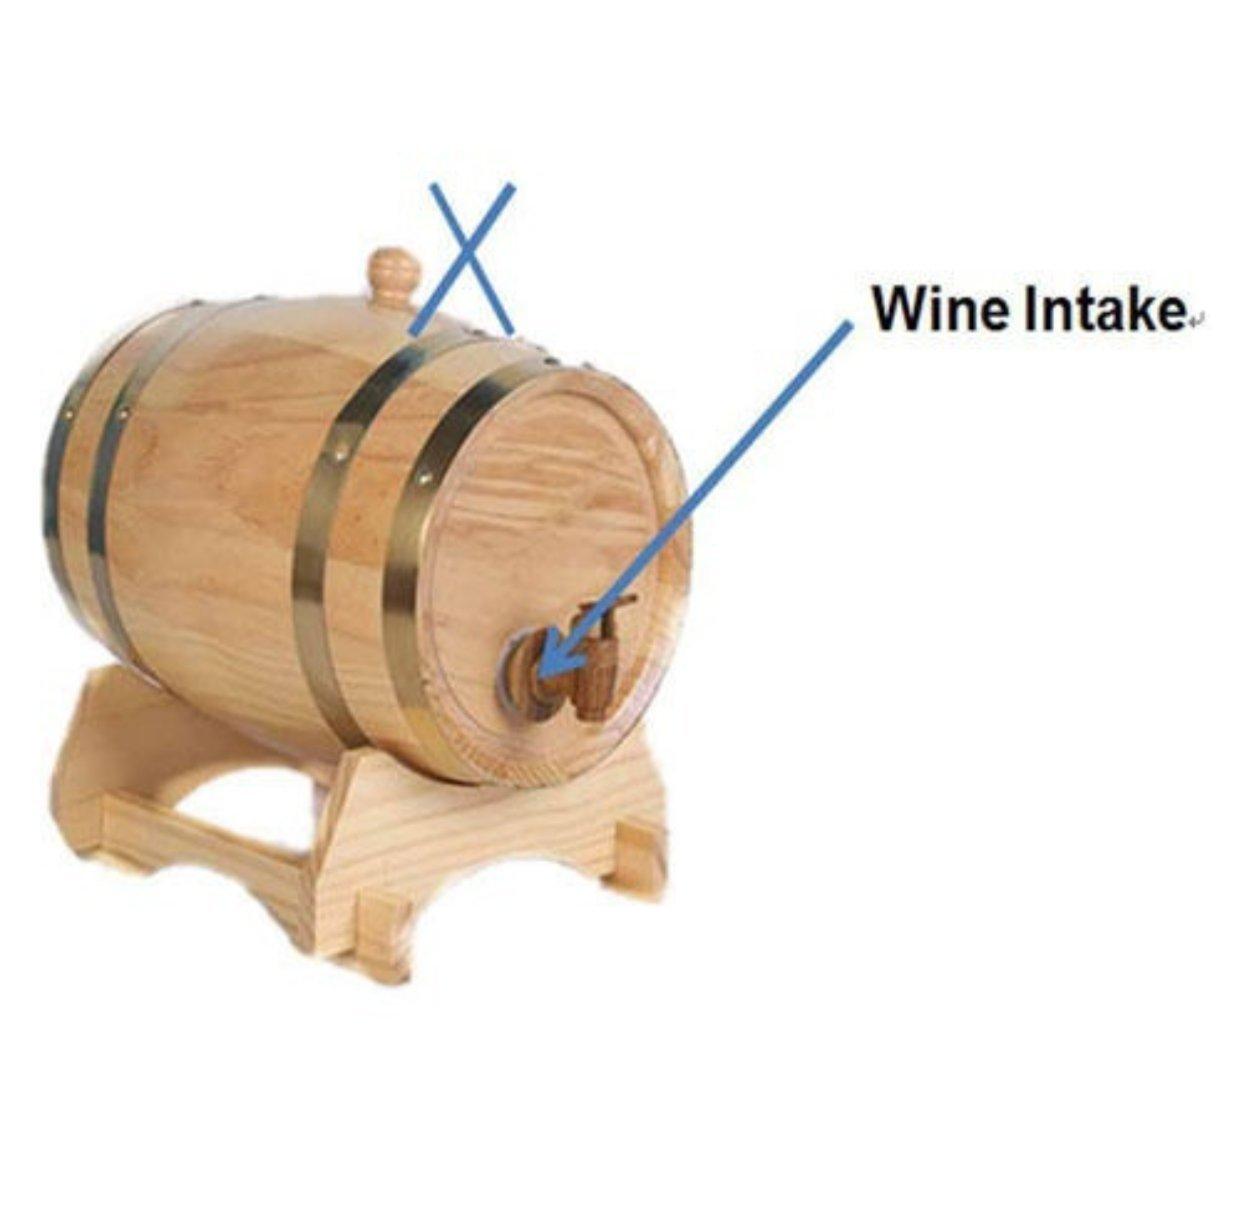 Whiskey Wine Barrel Oak Barrel Aging Whiskey Beer Wine Bourbon Tequila & More Guaranteed no leakage (3L - White) Rainbow_Road_Wine Barrel